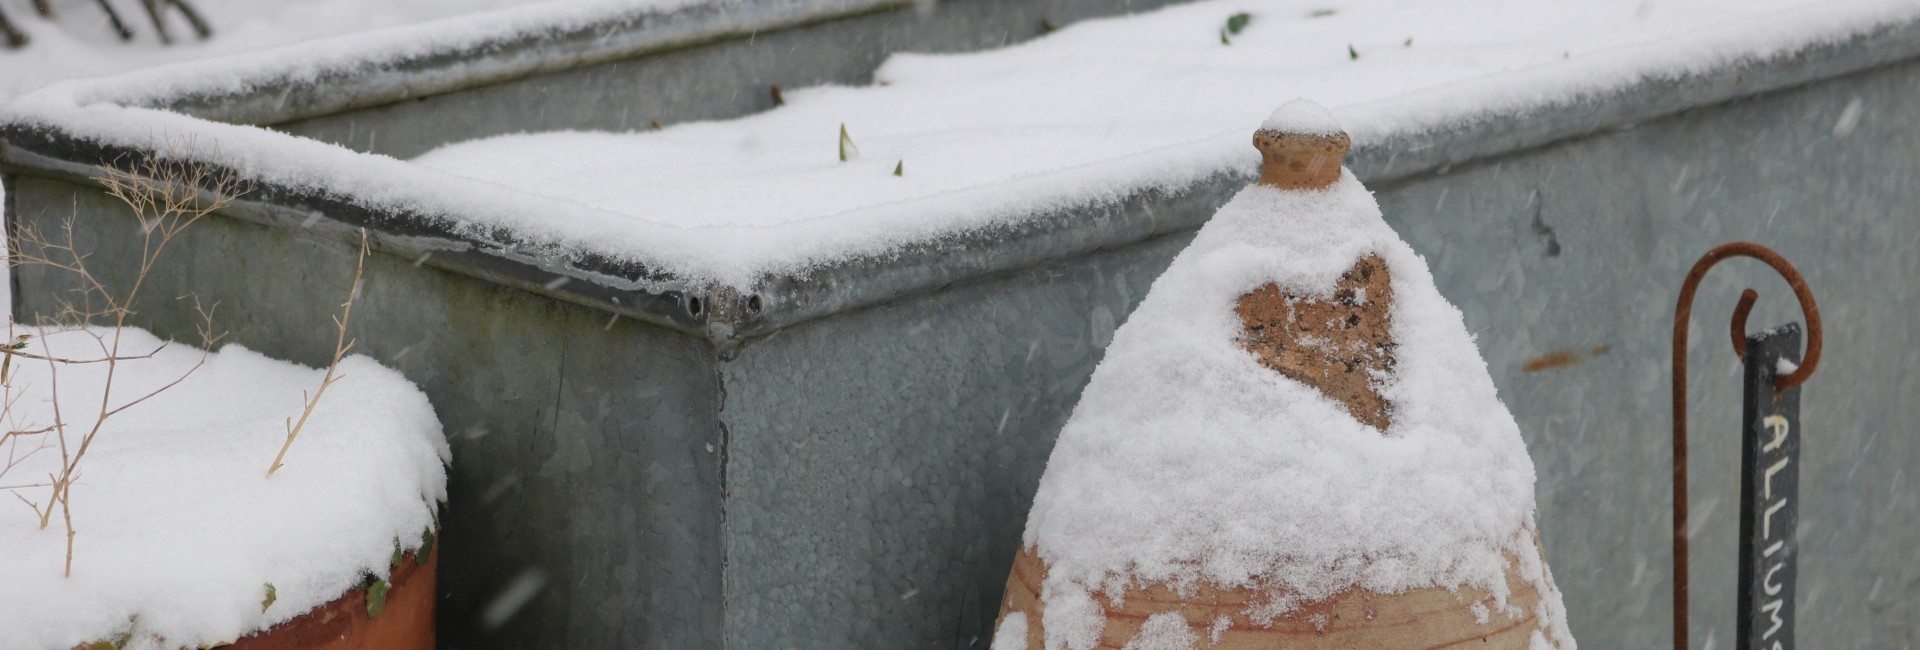 A Snowy Plot